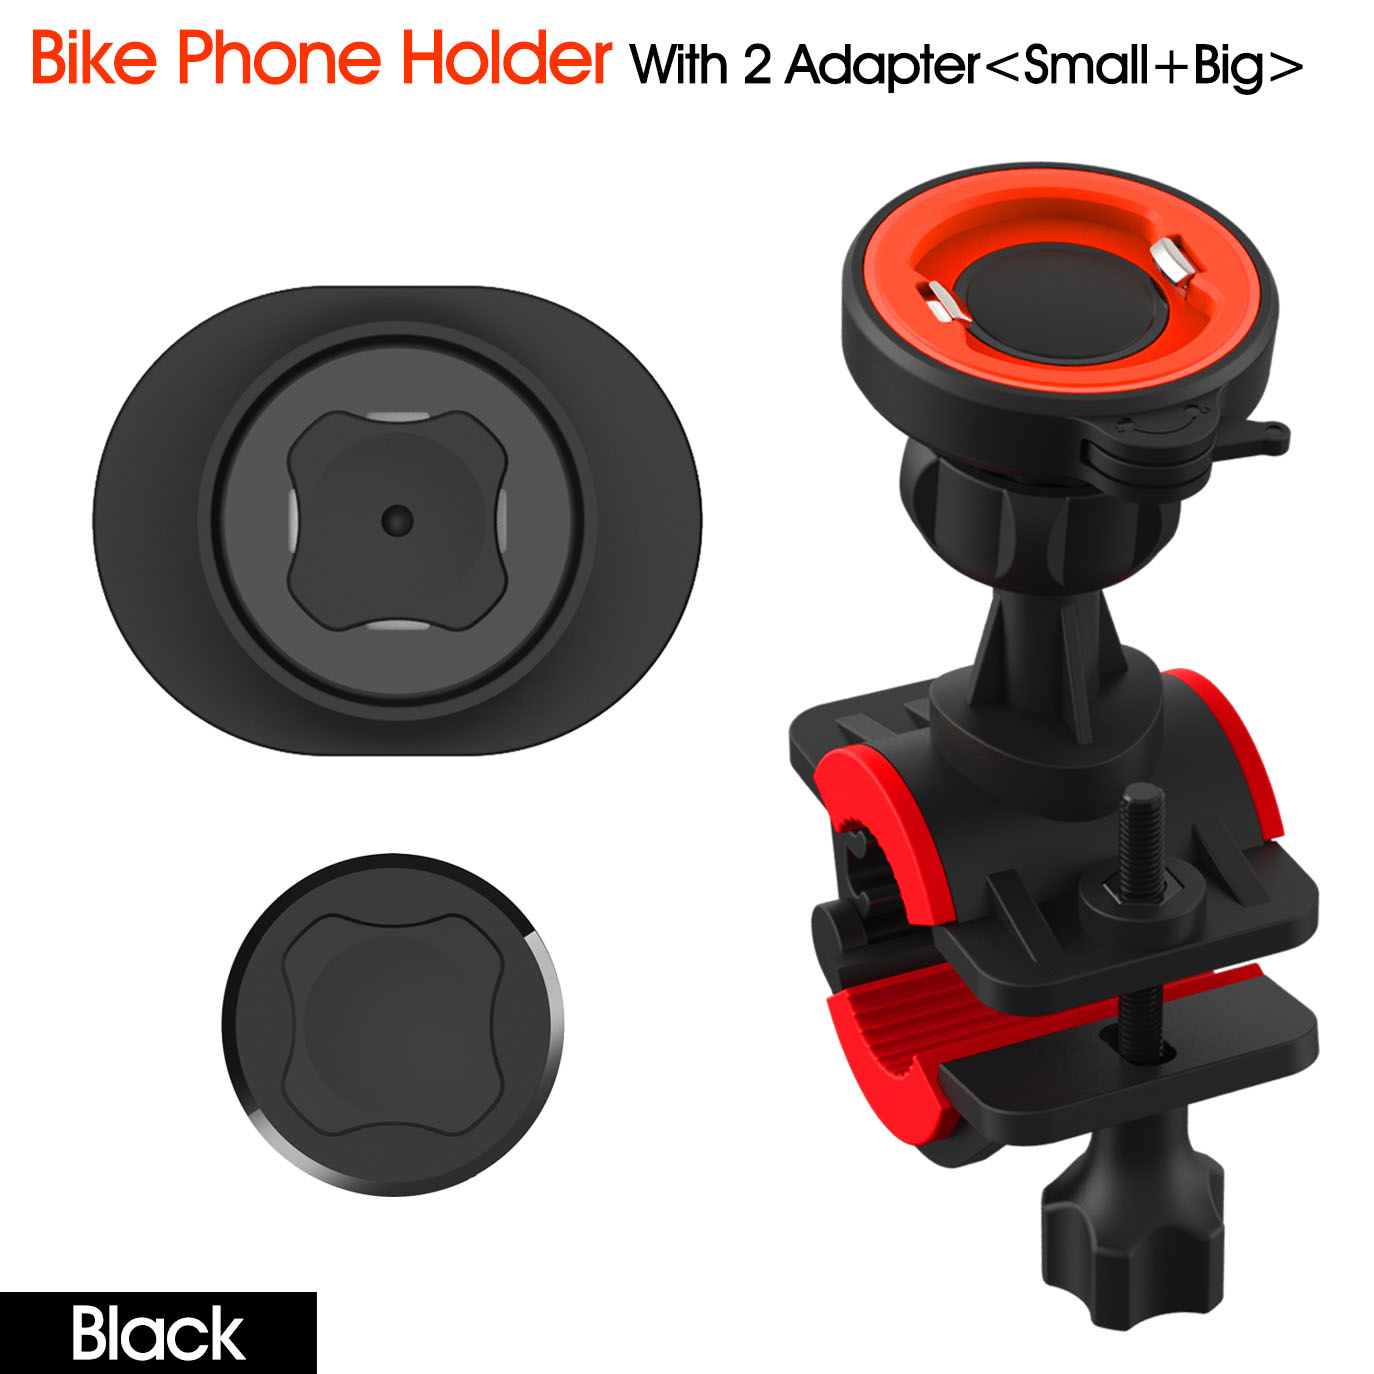 Bike Phone Mount Motorcycle Phone Mount Detachable Adjustable 360° Rotation Bike Phone Holder for Bike Bicycle Handlebars Universal for iPhone 11 Pro Max Xr Xs X 8 Plus, Samsung Galaxy, Google Pixel